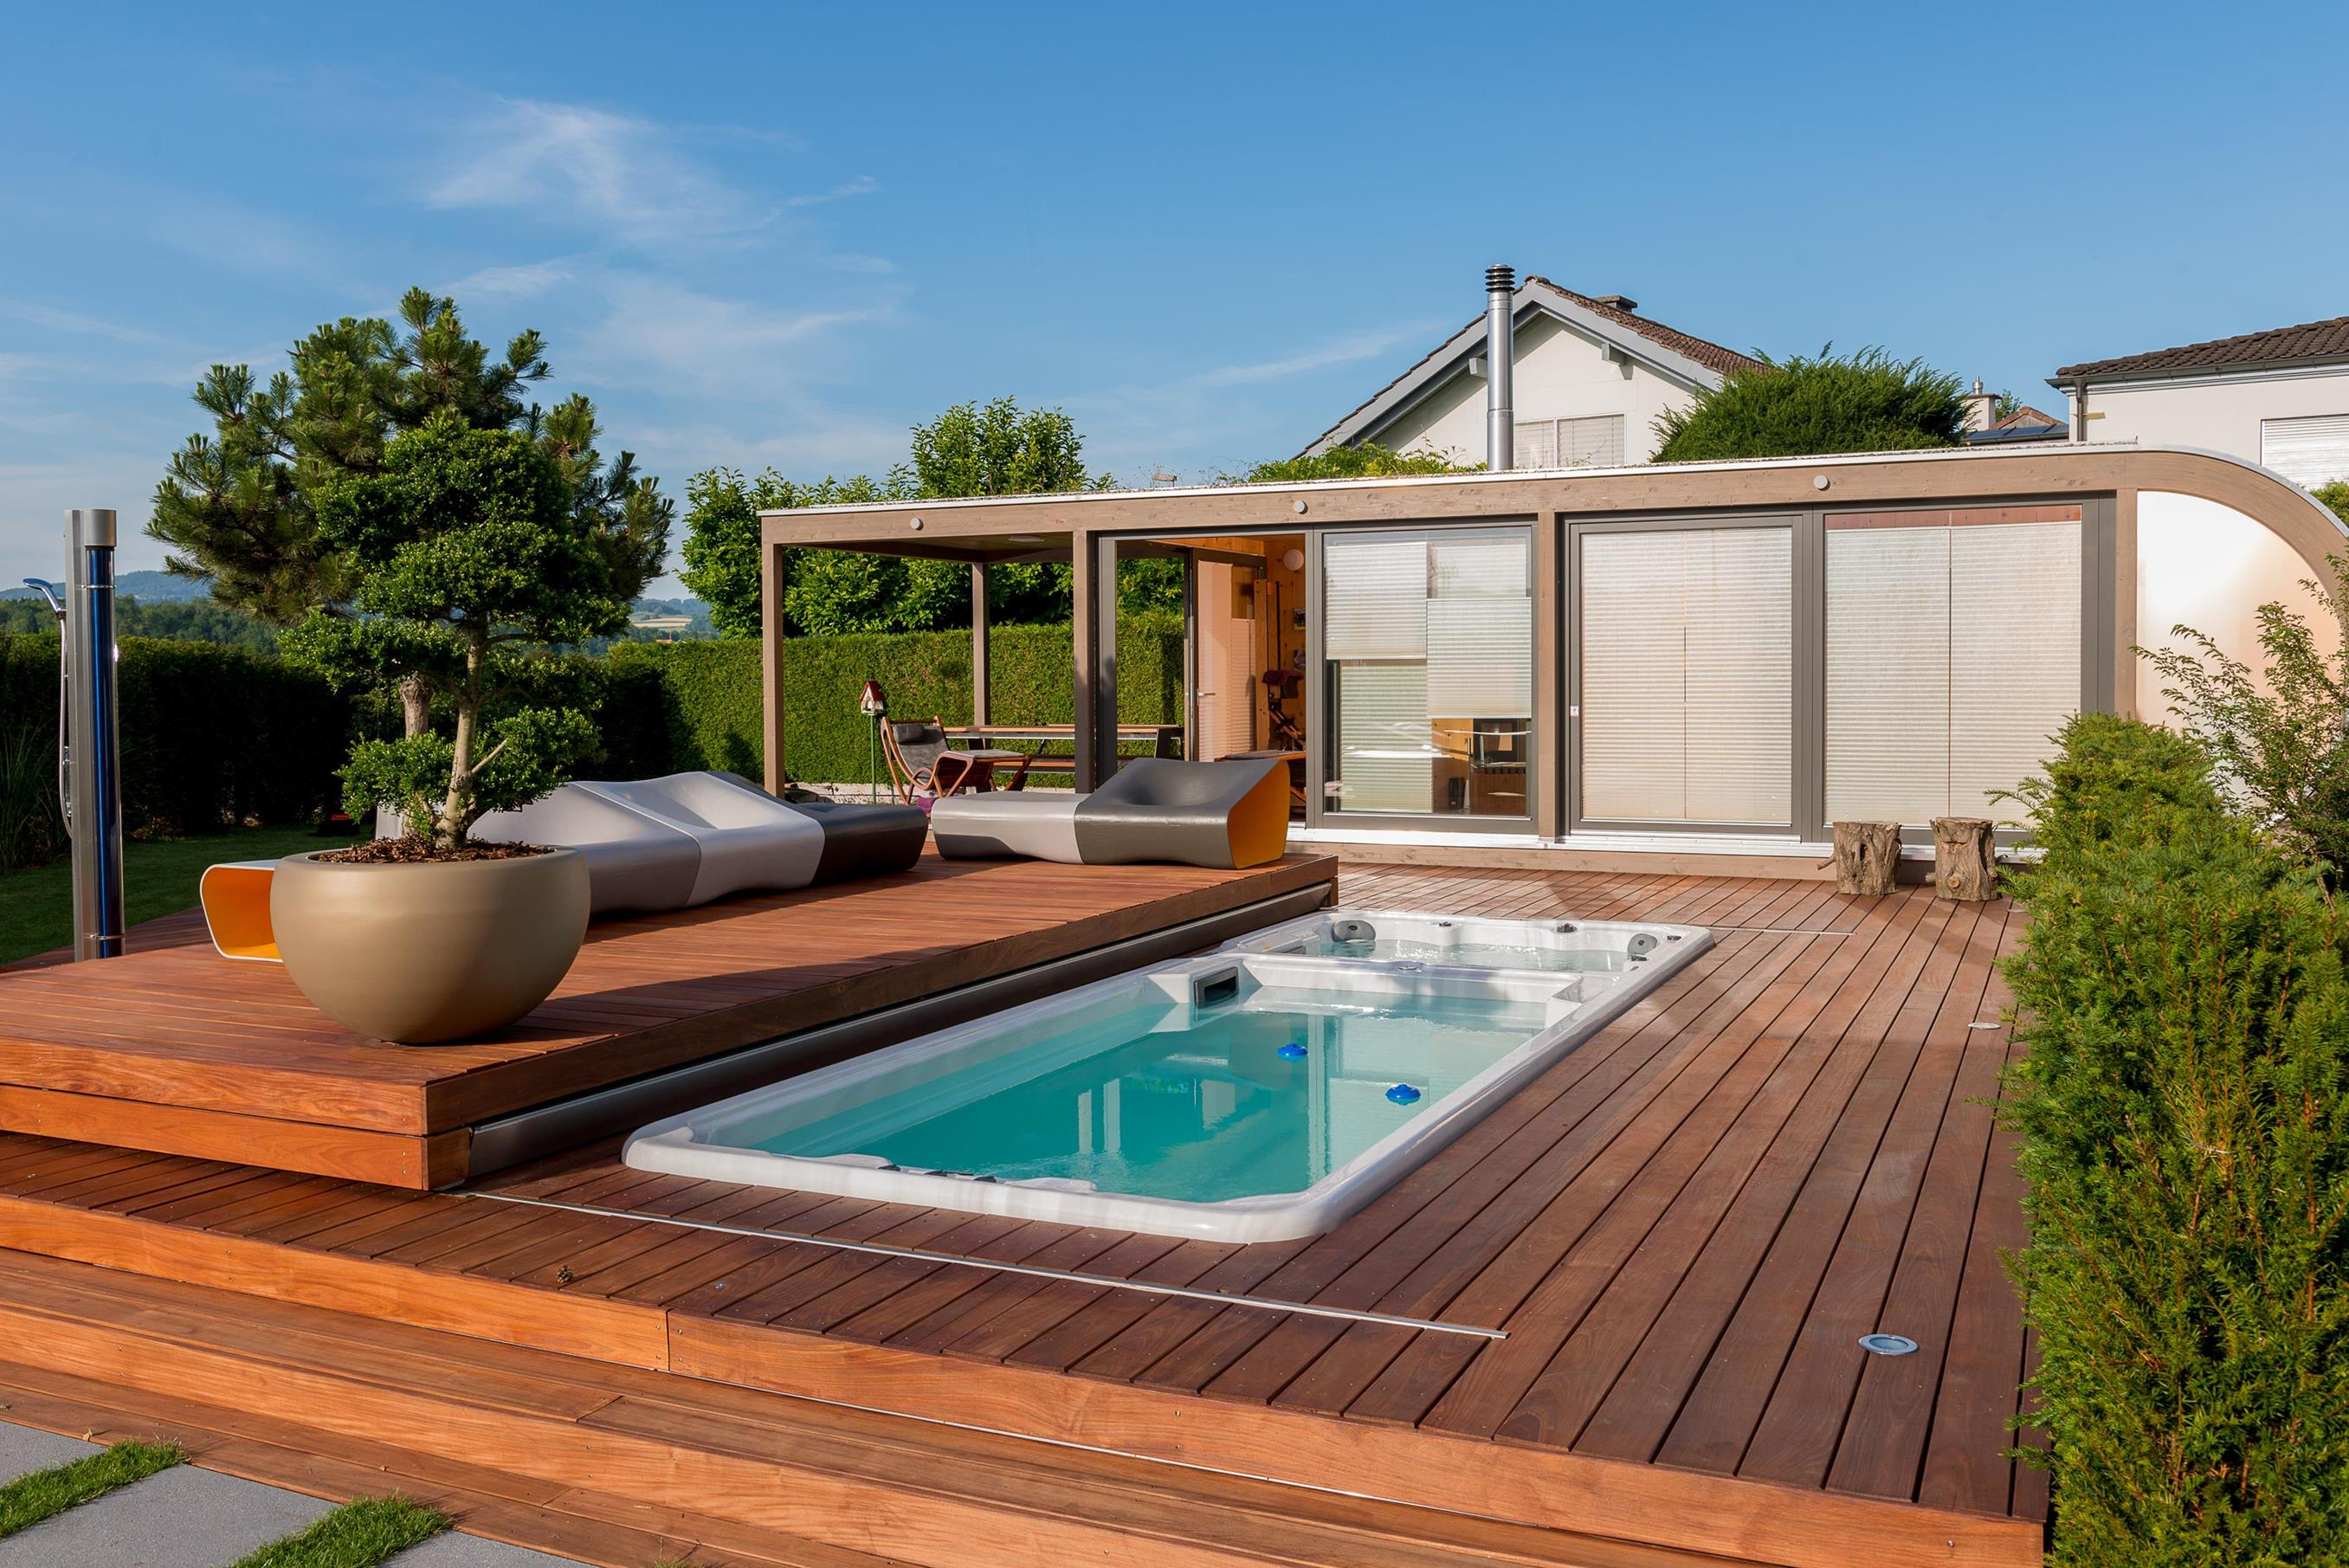 luxuri ses wellness poolhaus bei z rich werner ettwein gmbh. Black Bedroom Furniture Sets. Home Design Ideas